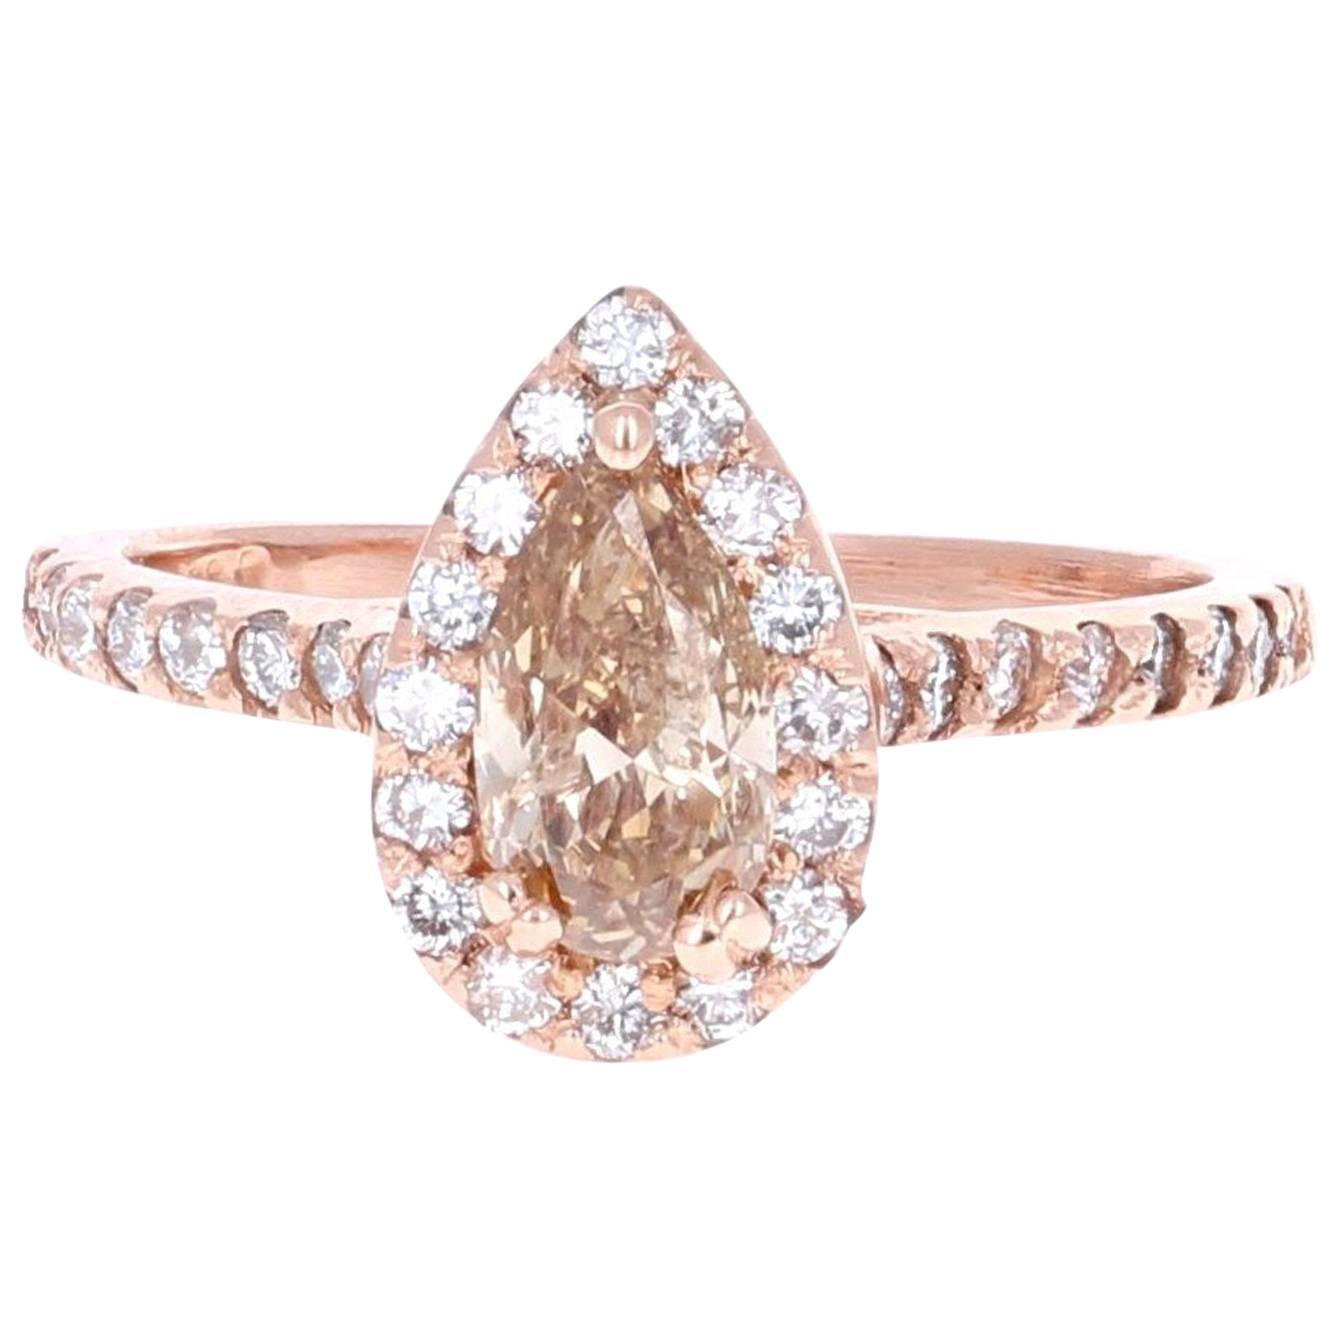 1.55 Carat Fancy Pear Cut Diamond Engagement Ring in 14K Rose Gold